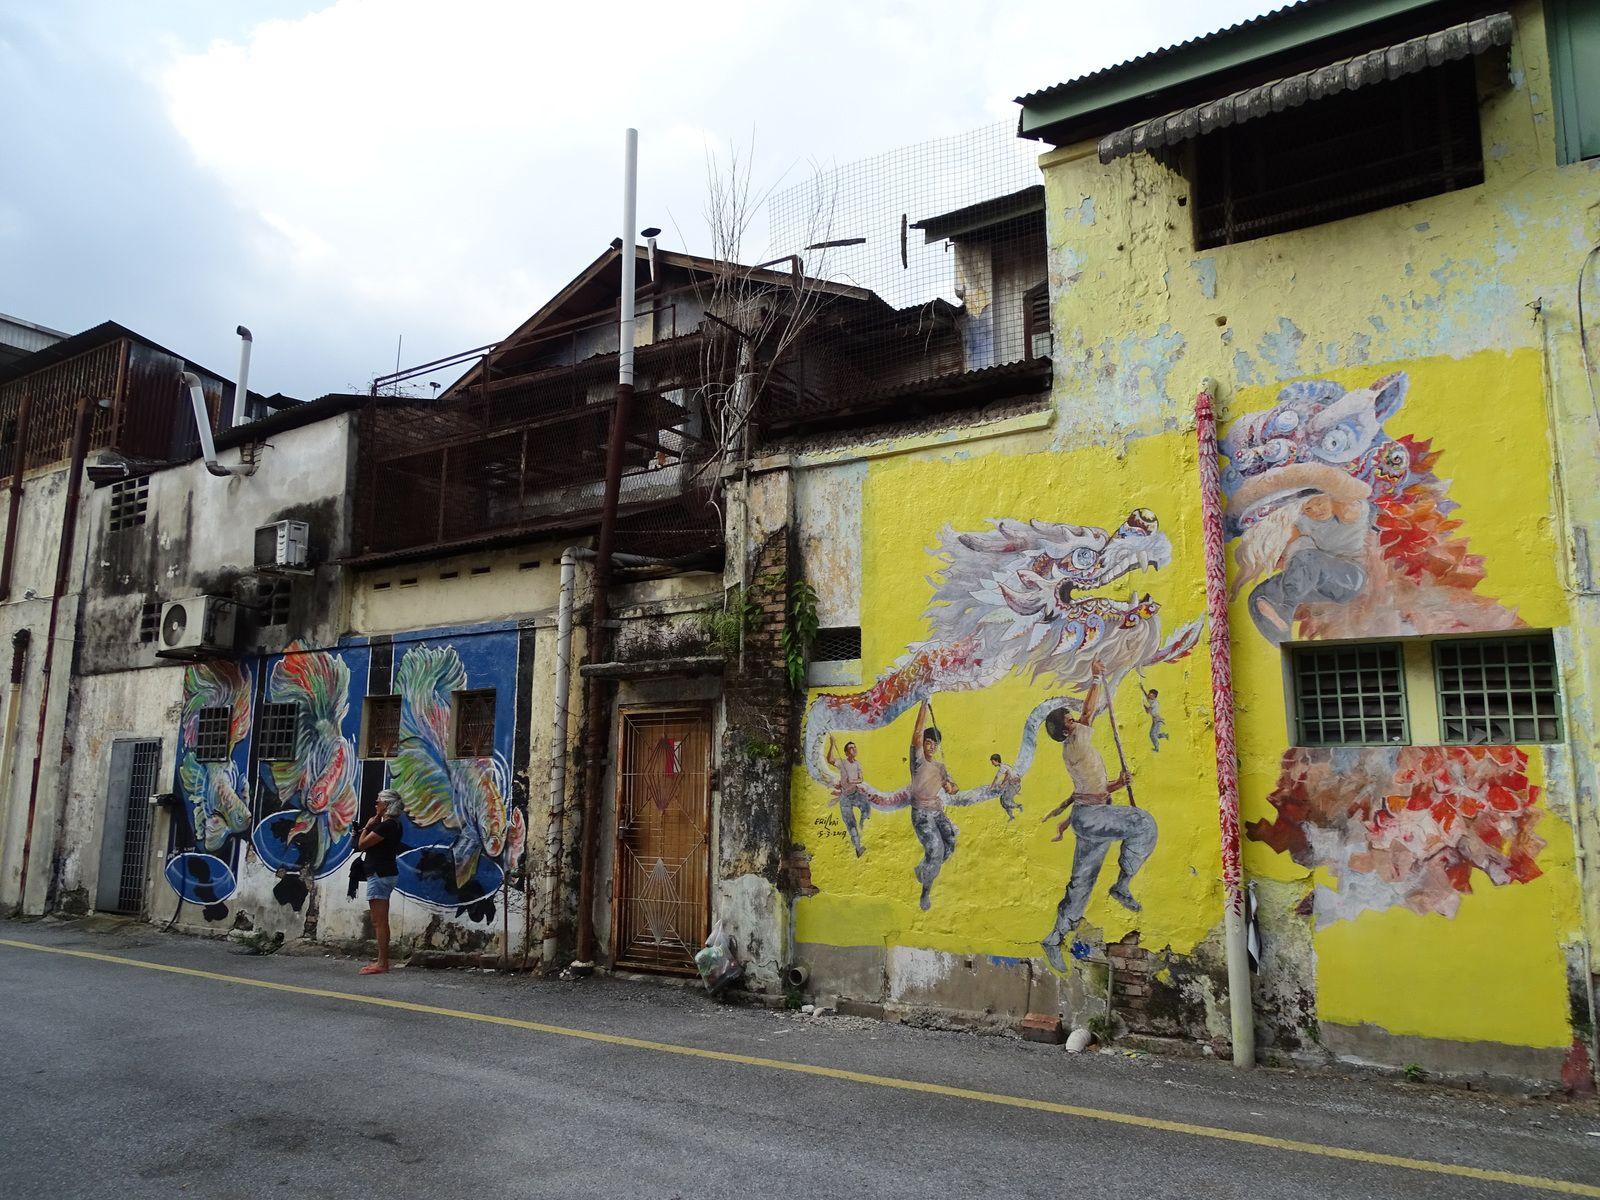 Voyage en Malaisie 2020. IPOH. ILE DE PANGKOR. GEORGETOWN.